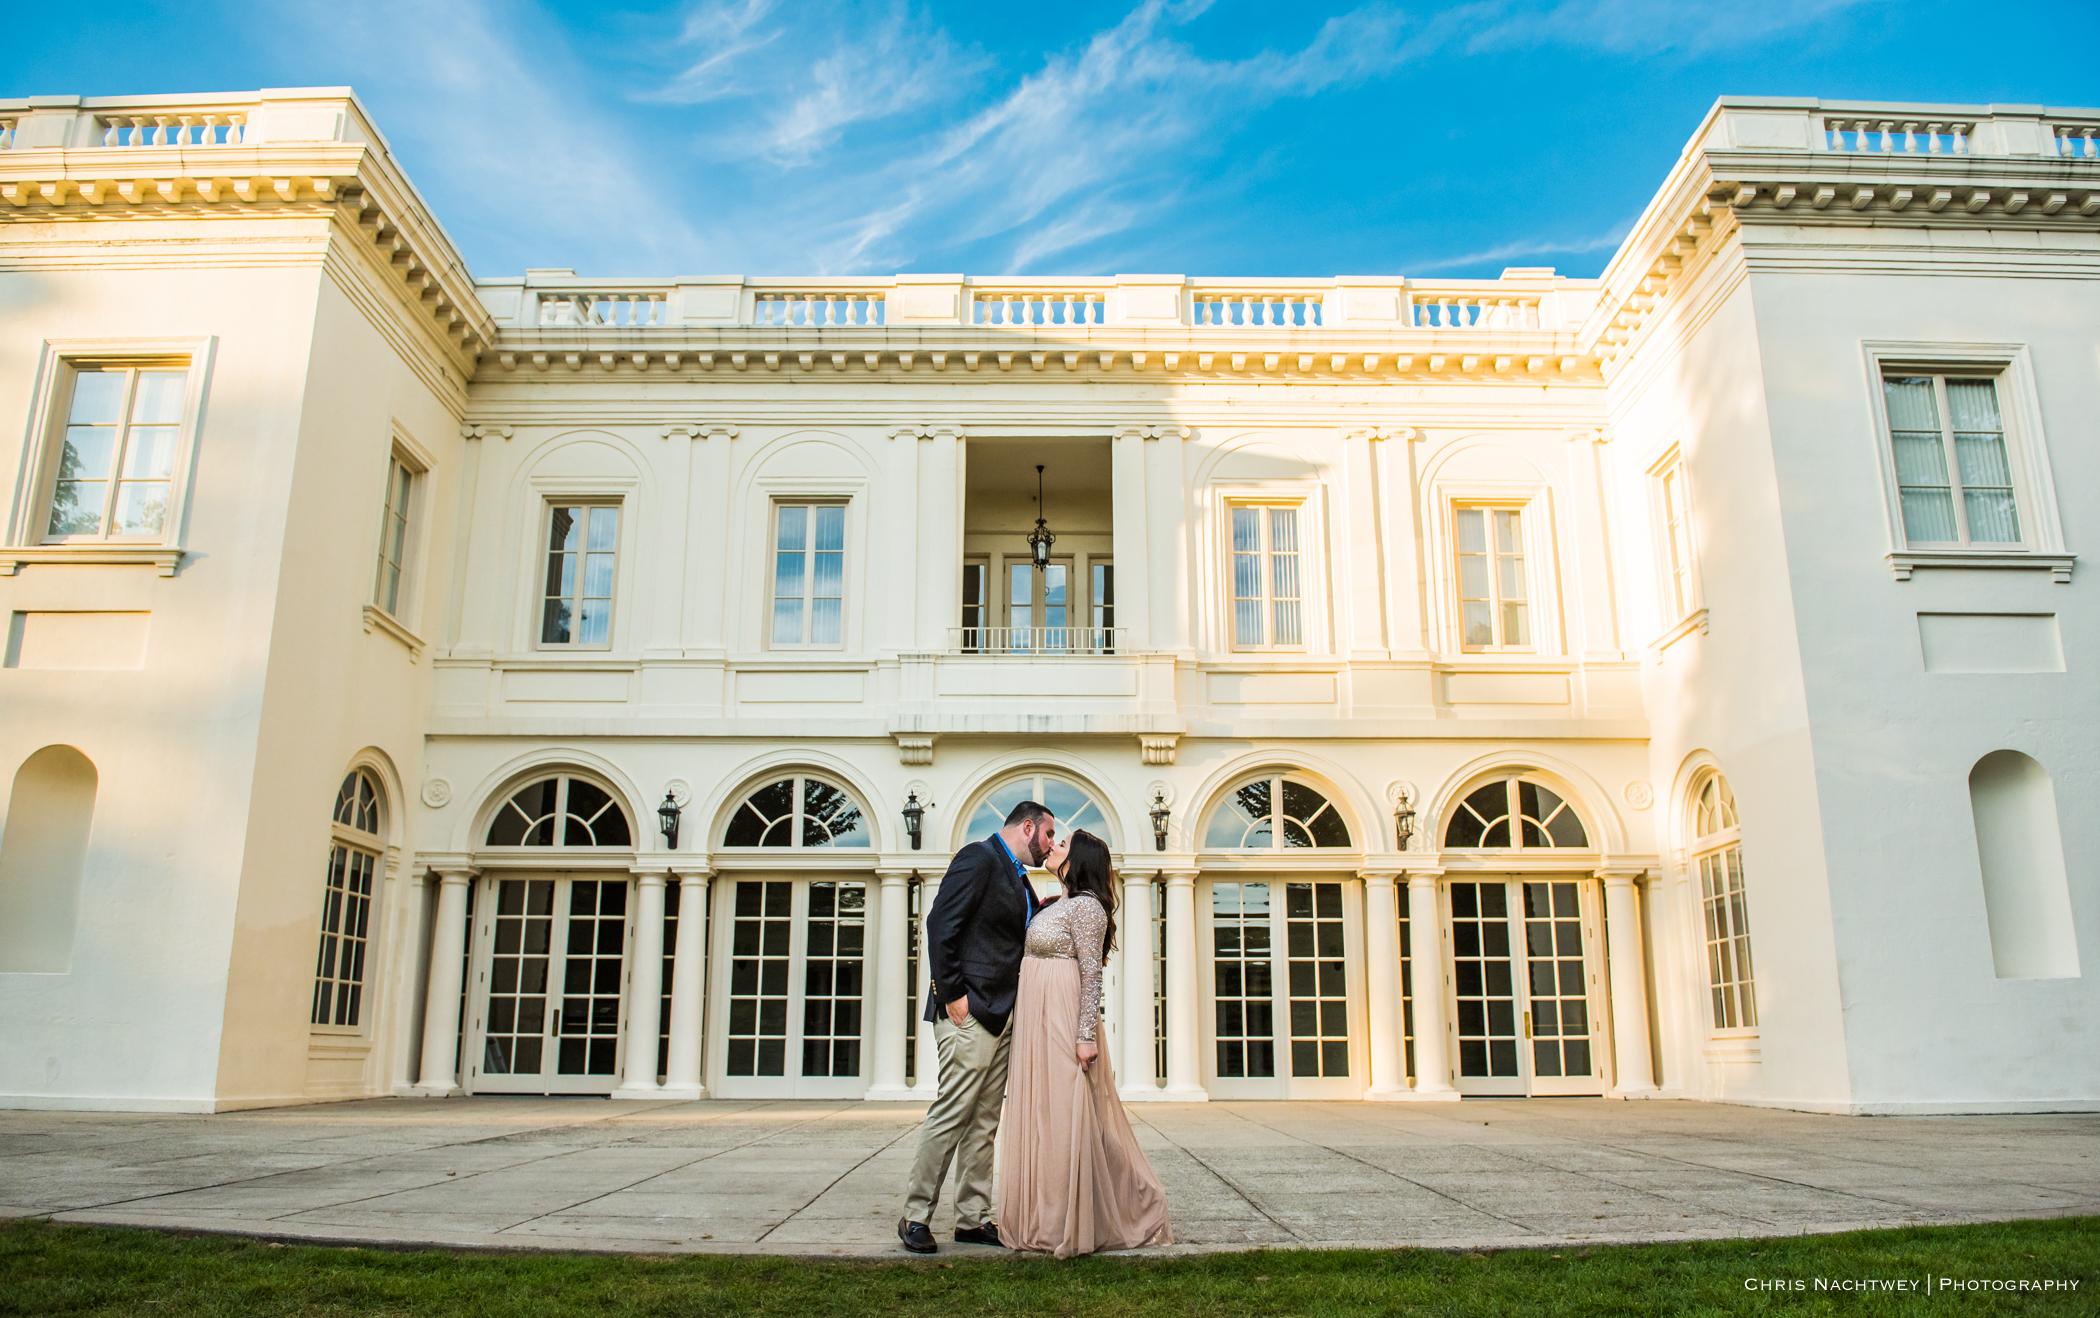 engagement-photos-wadsworth-mansion-ct-chris-nachtwey-photography-2017-7.jpg